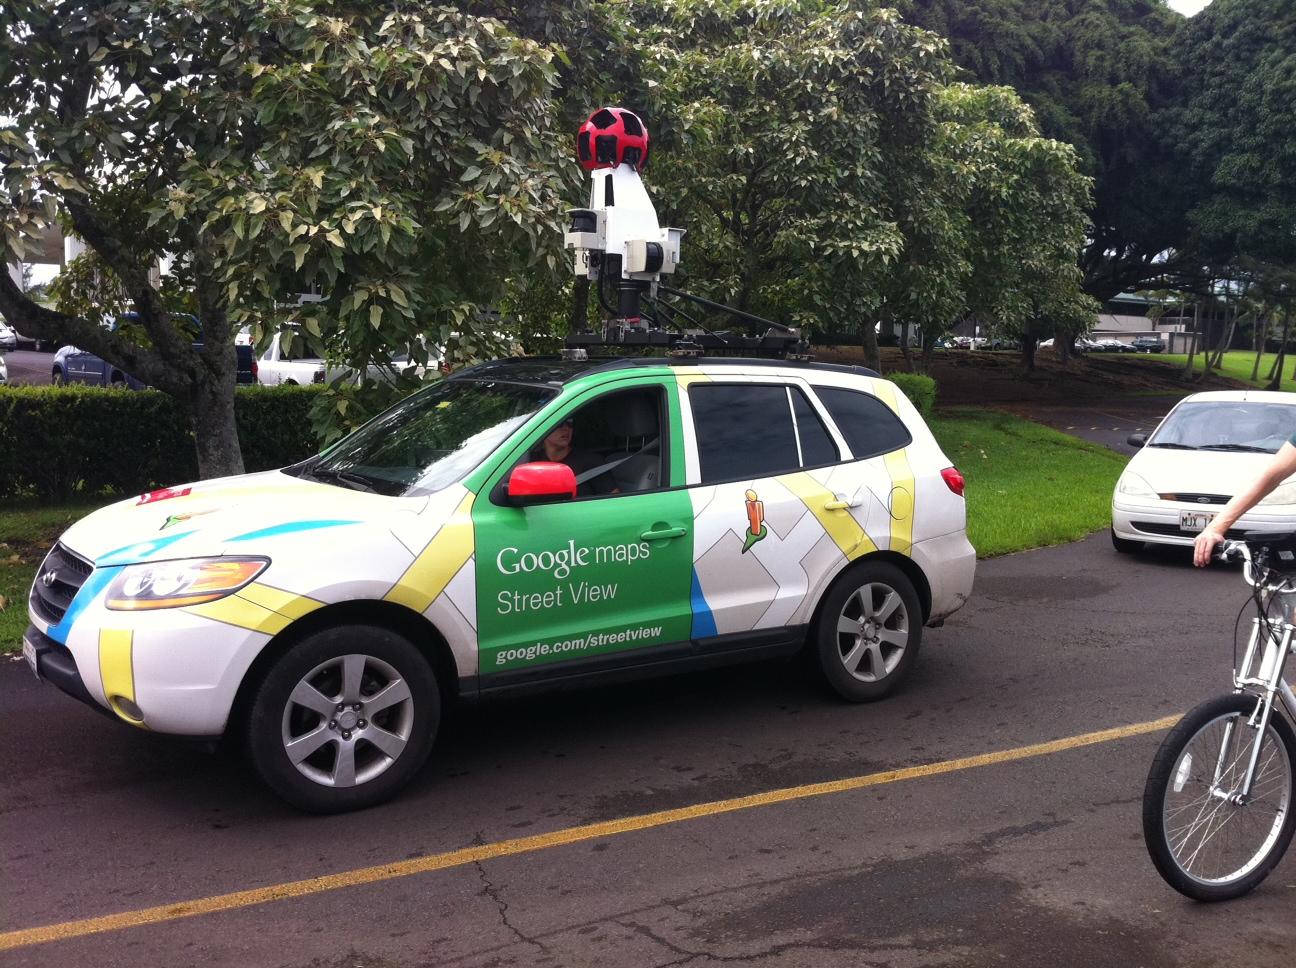 Street View – The Bike and The Car on the Big Island » Google Car